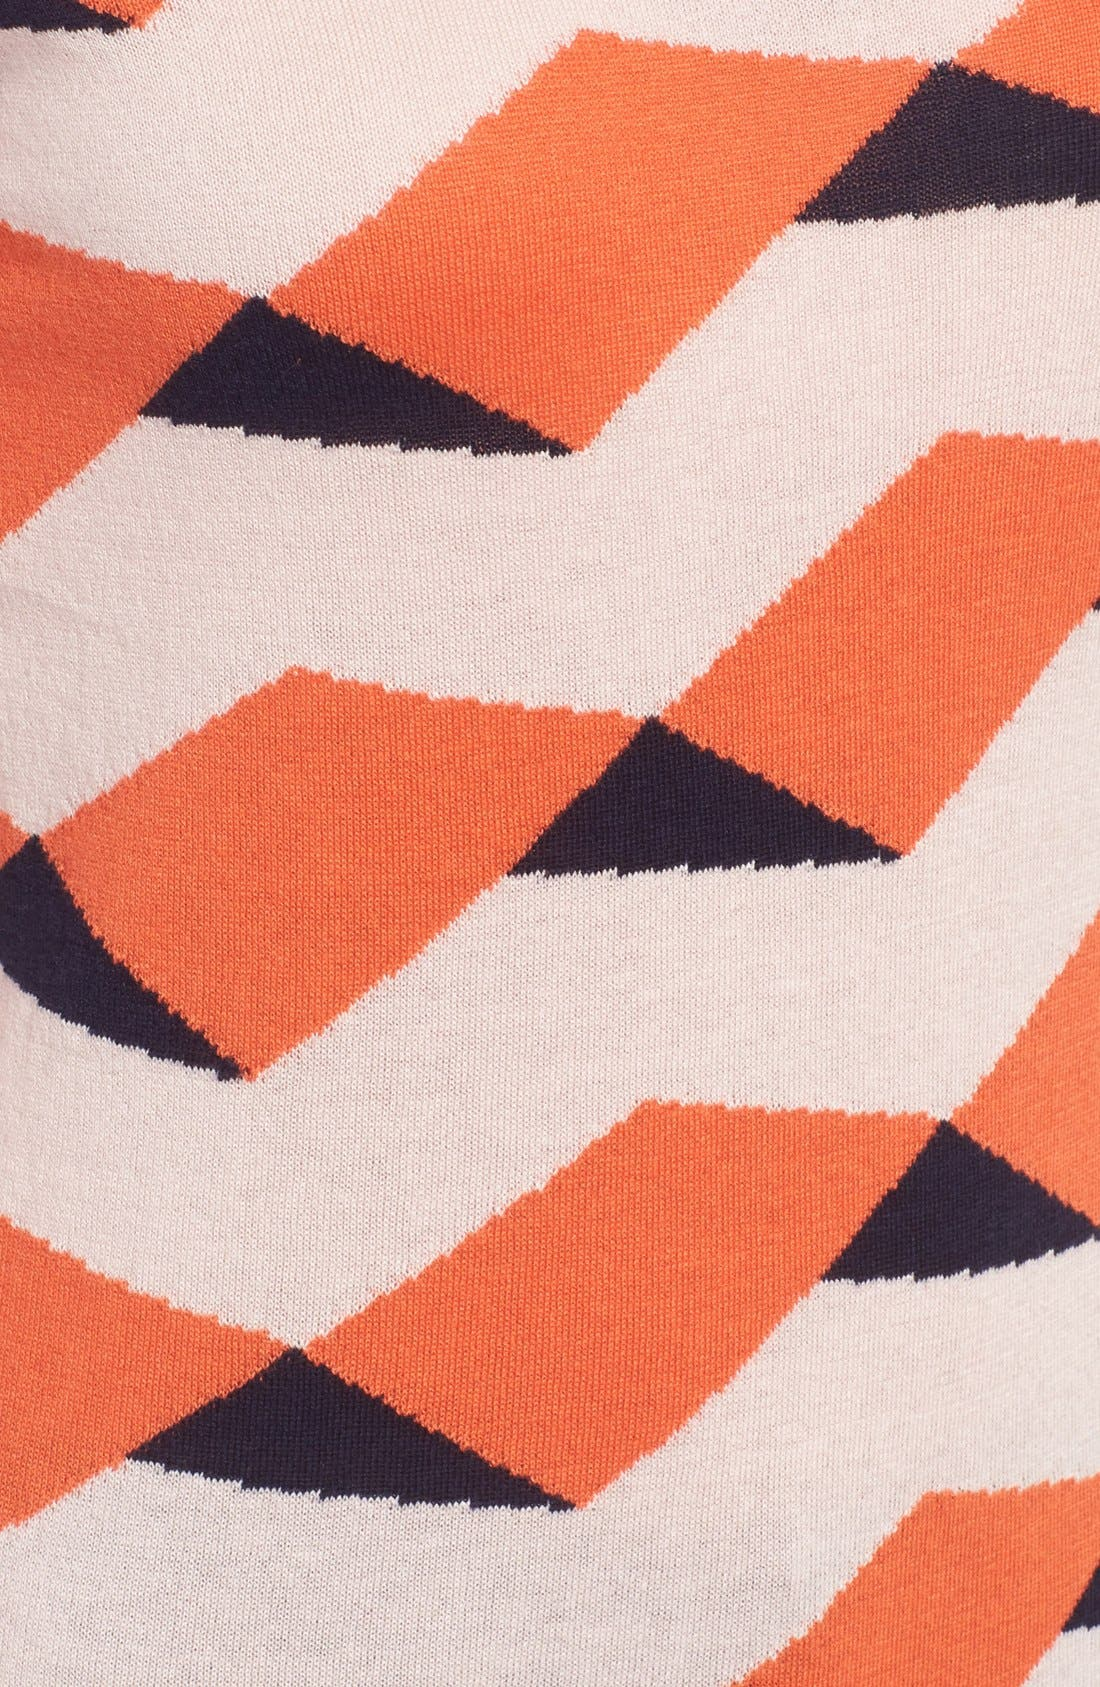 Cotton Blend Pullover,                             Alternate thumbnail 145, color,